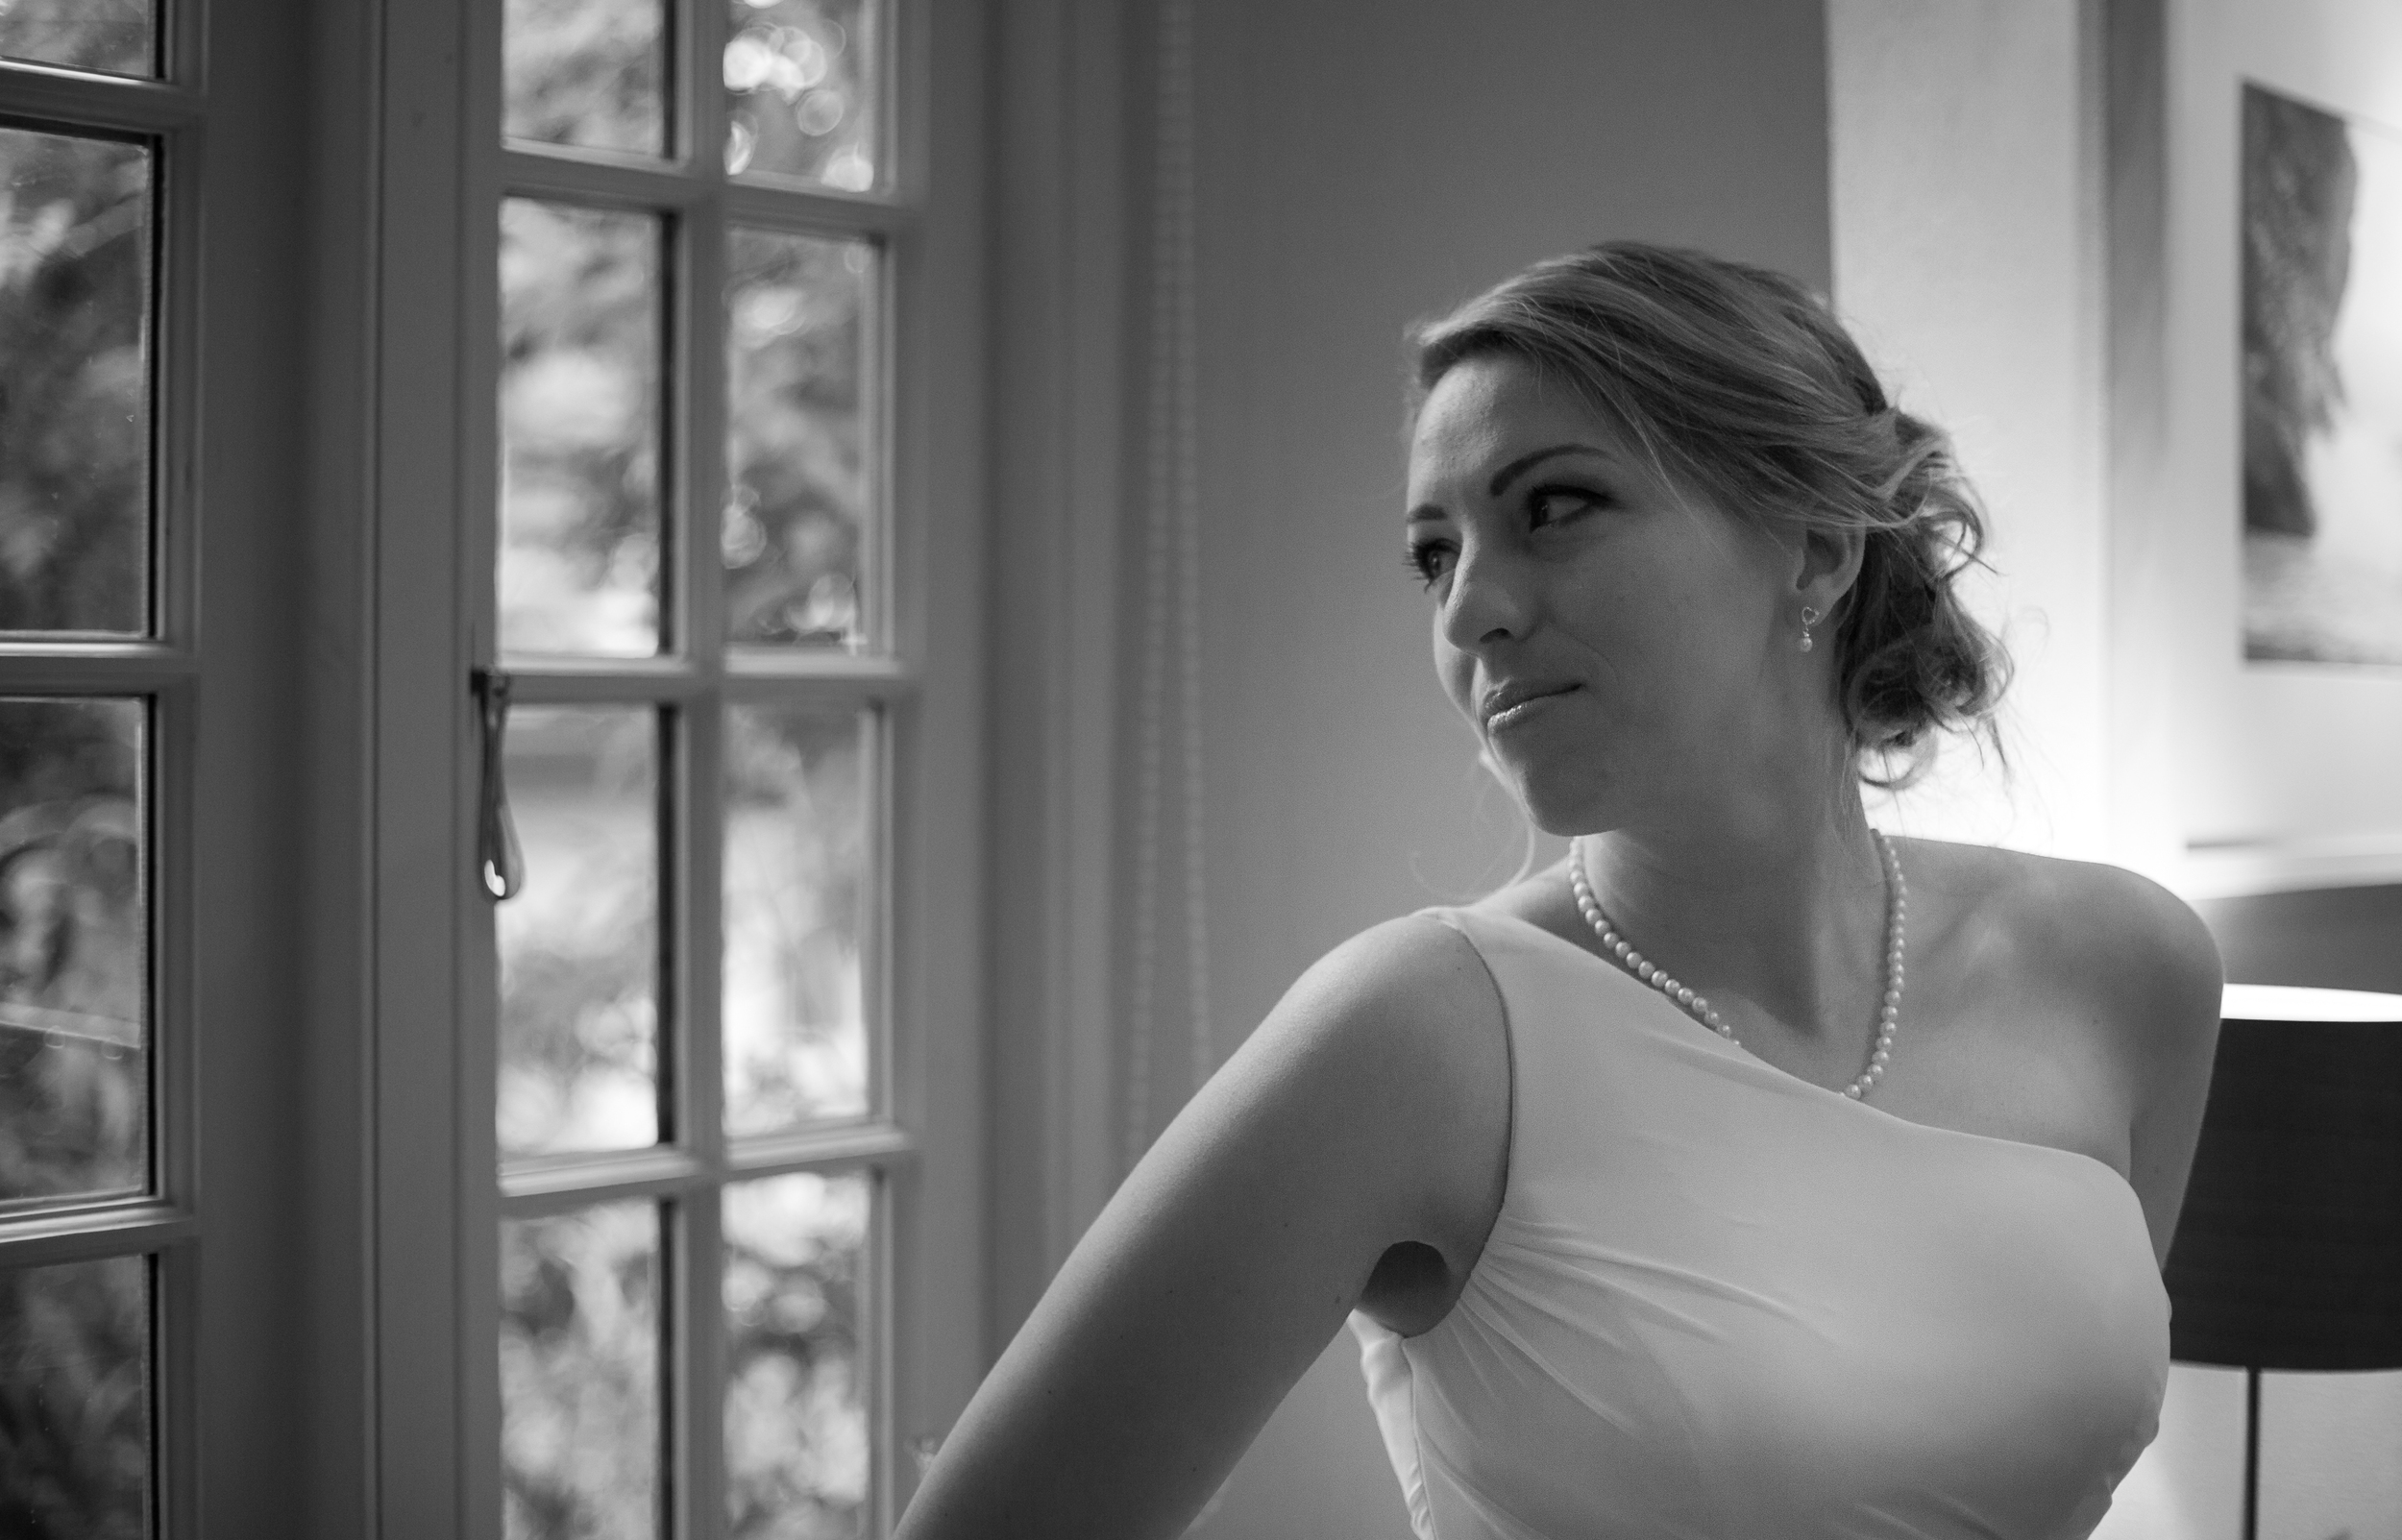 dartmouth-bride-prep-1-london-uk-destination-wedding-photography-Adam-Rowley